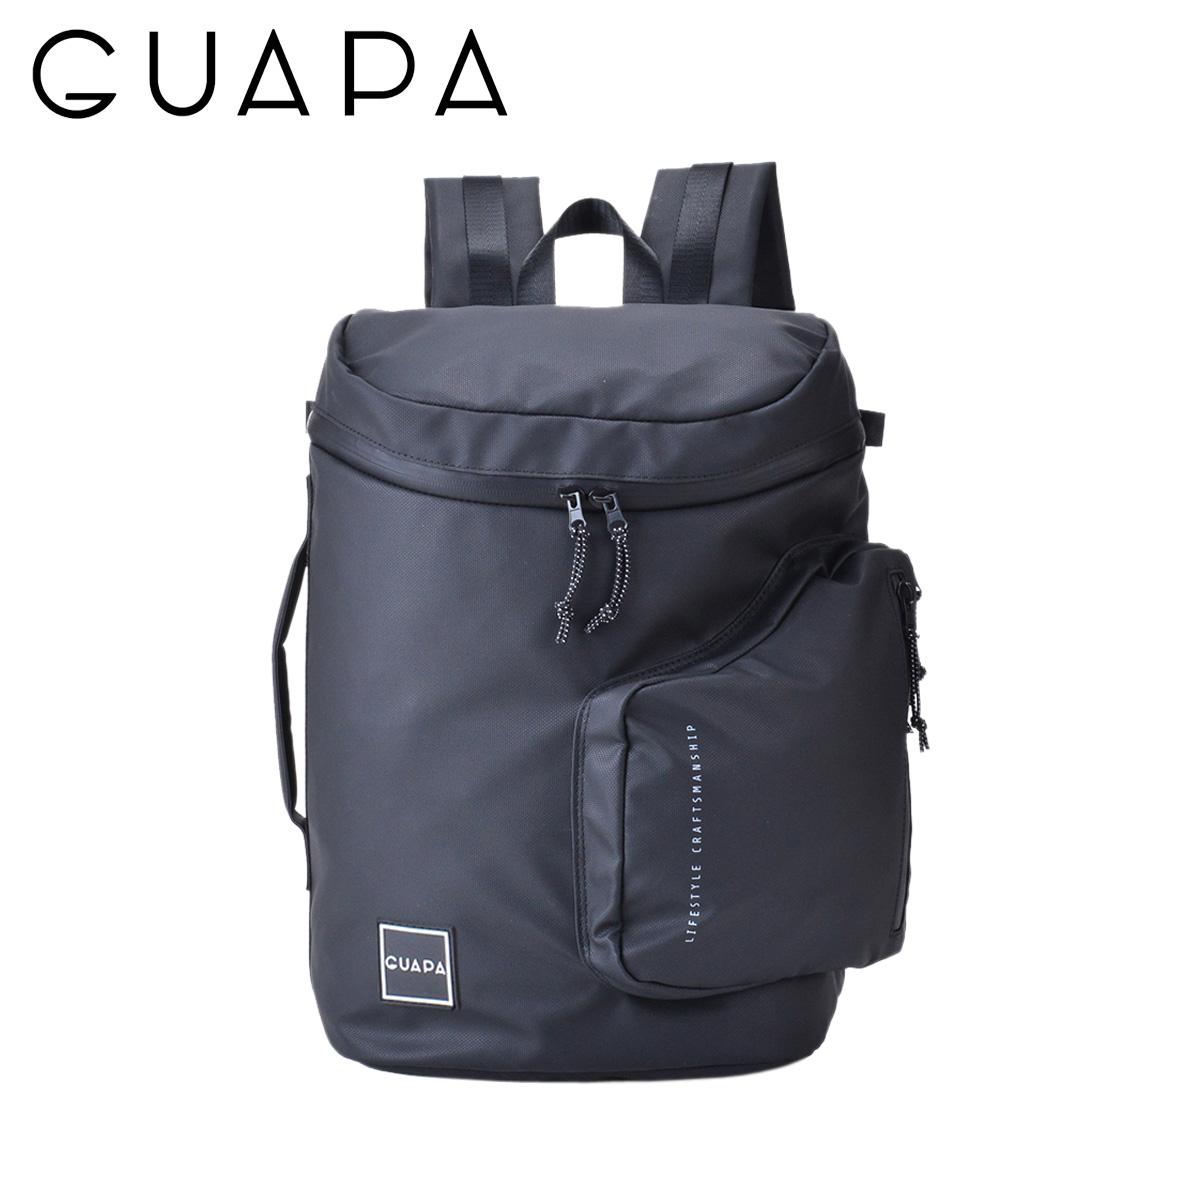 GUAPA GA SERIES グアパ リュック バッグ バックパック メンズ レディース 20L ブラック 黒 51009